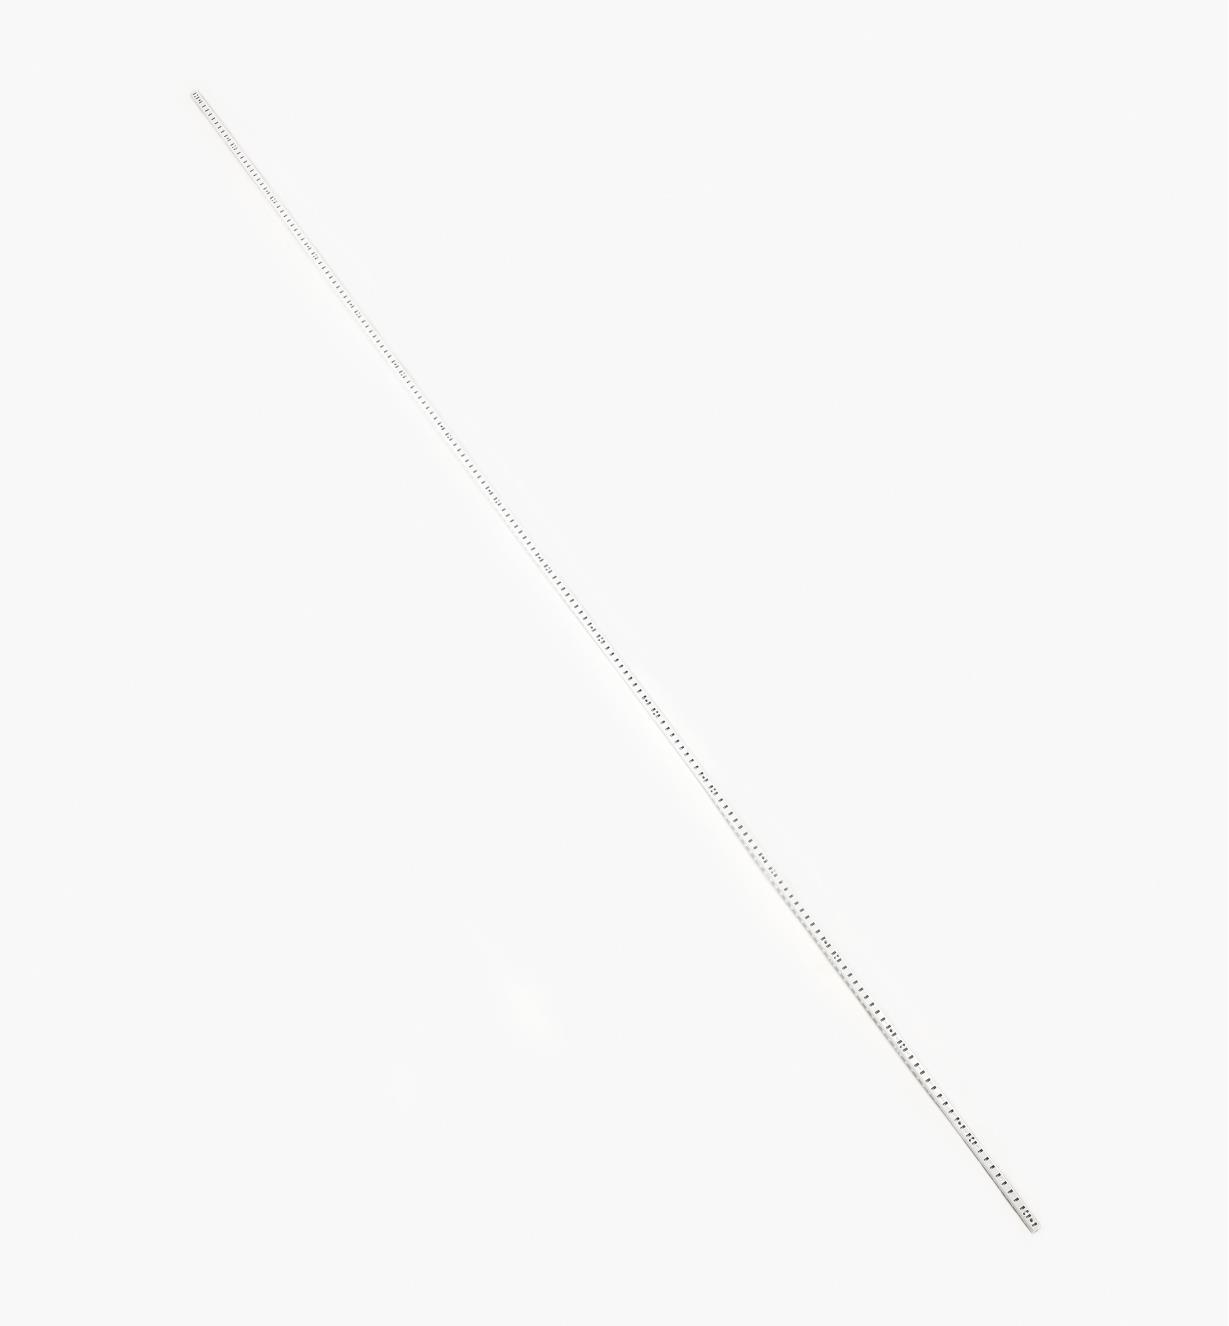 17K4032 - Crémaillère de 96po, fini blanc